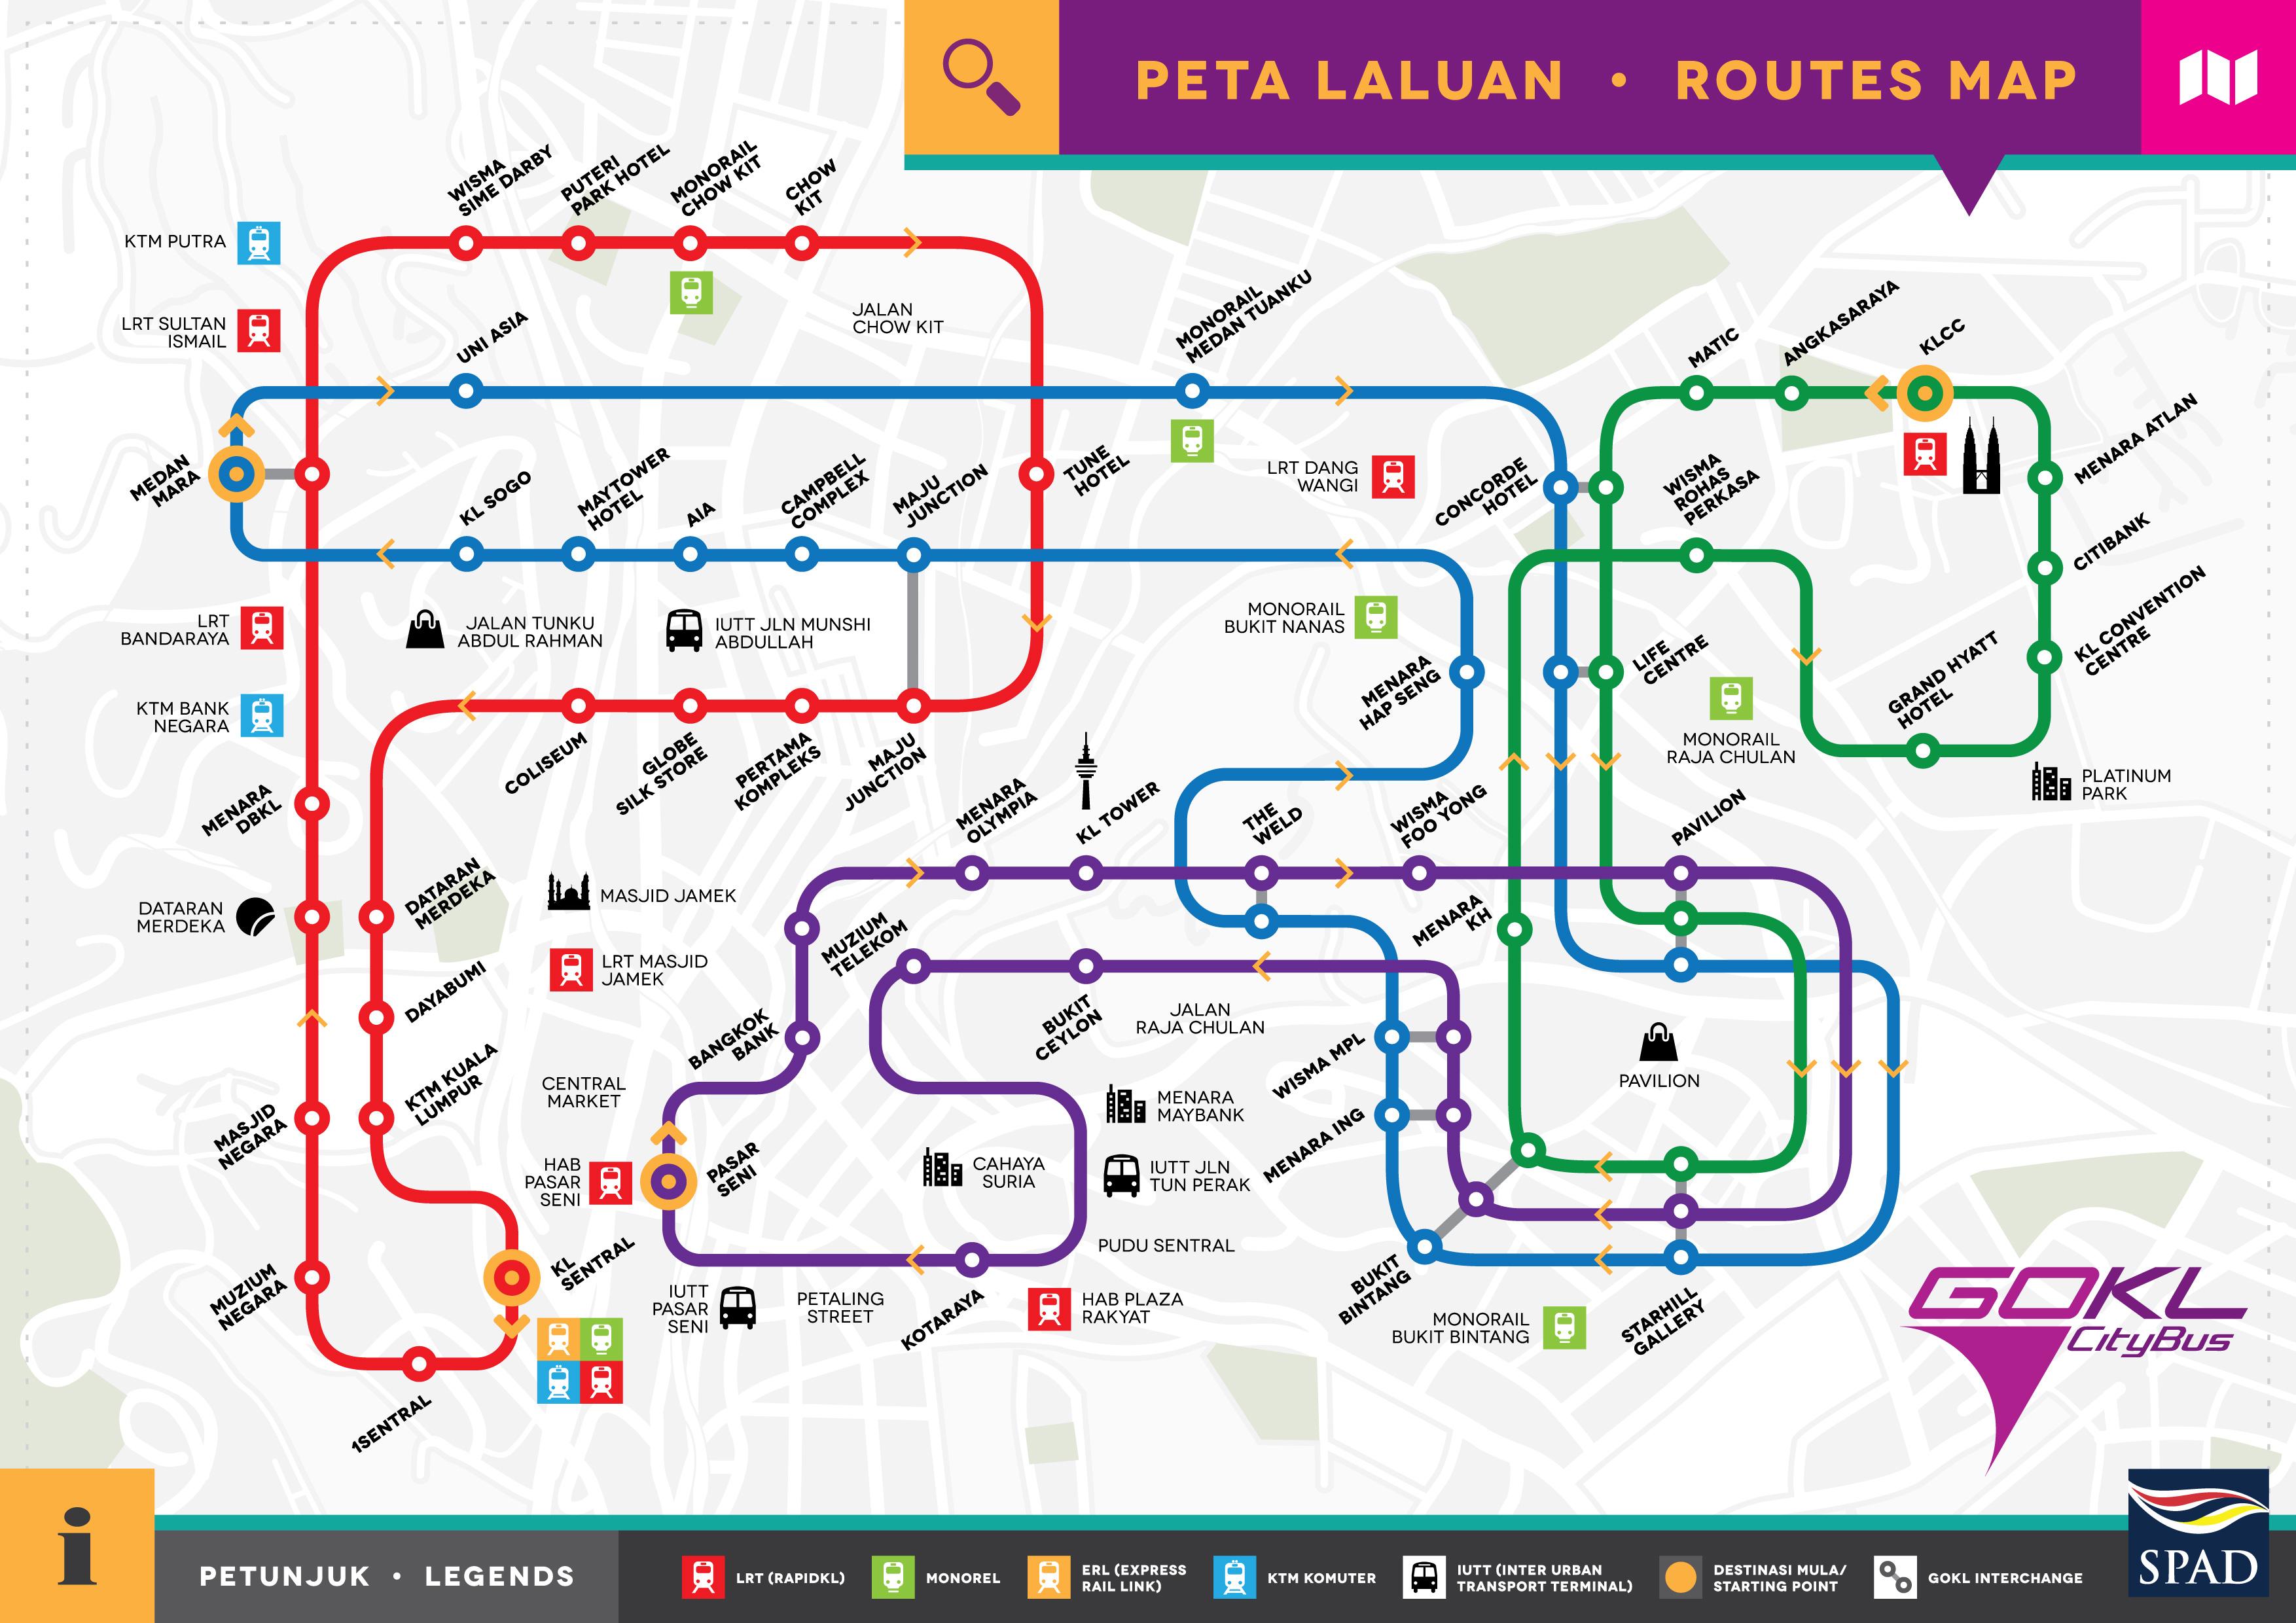 Go KL Bus 免費公車路線圖